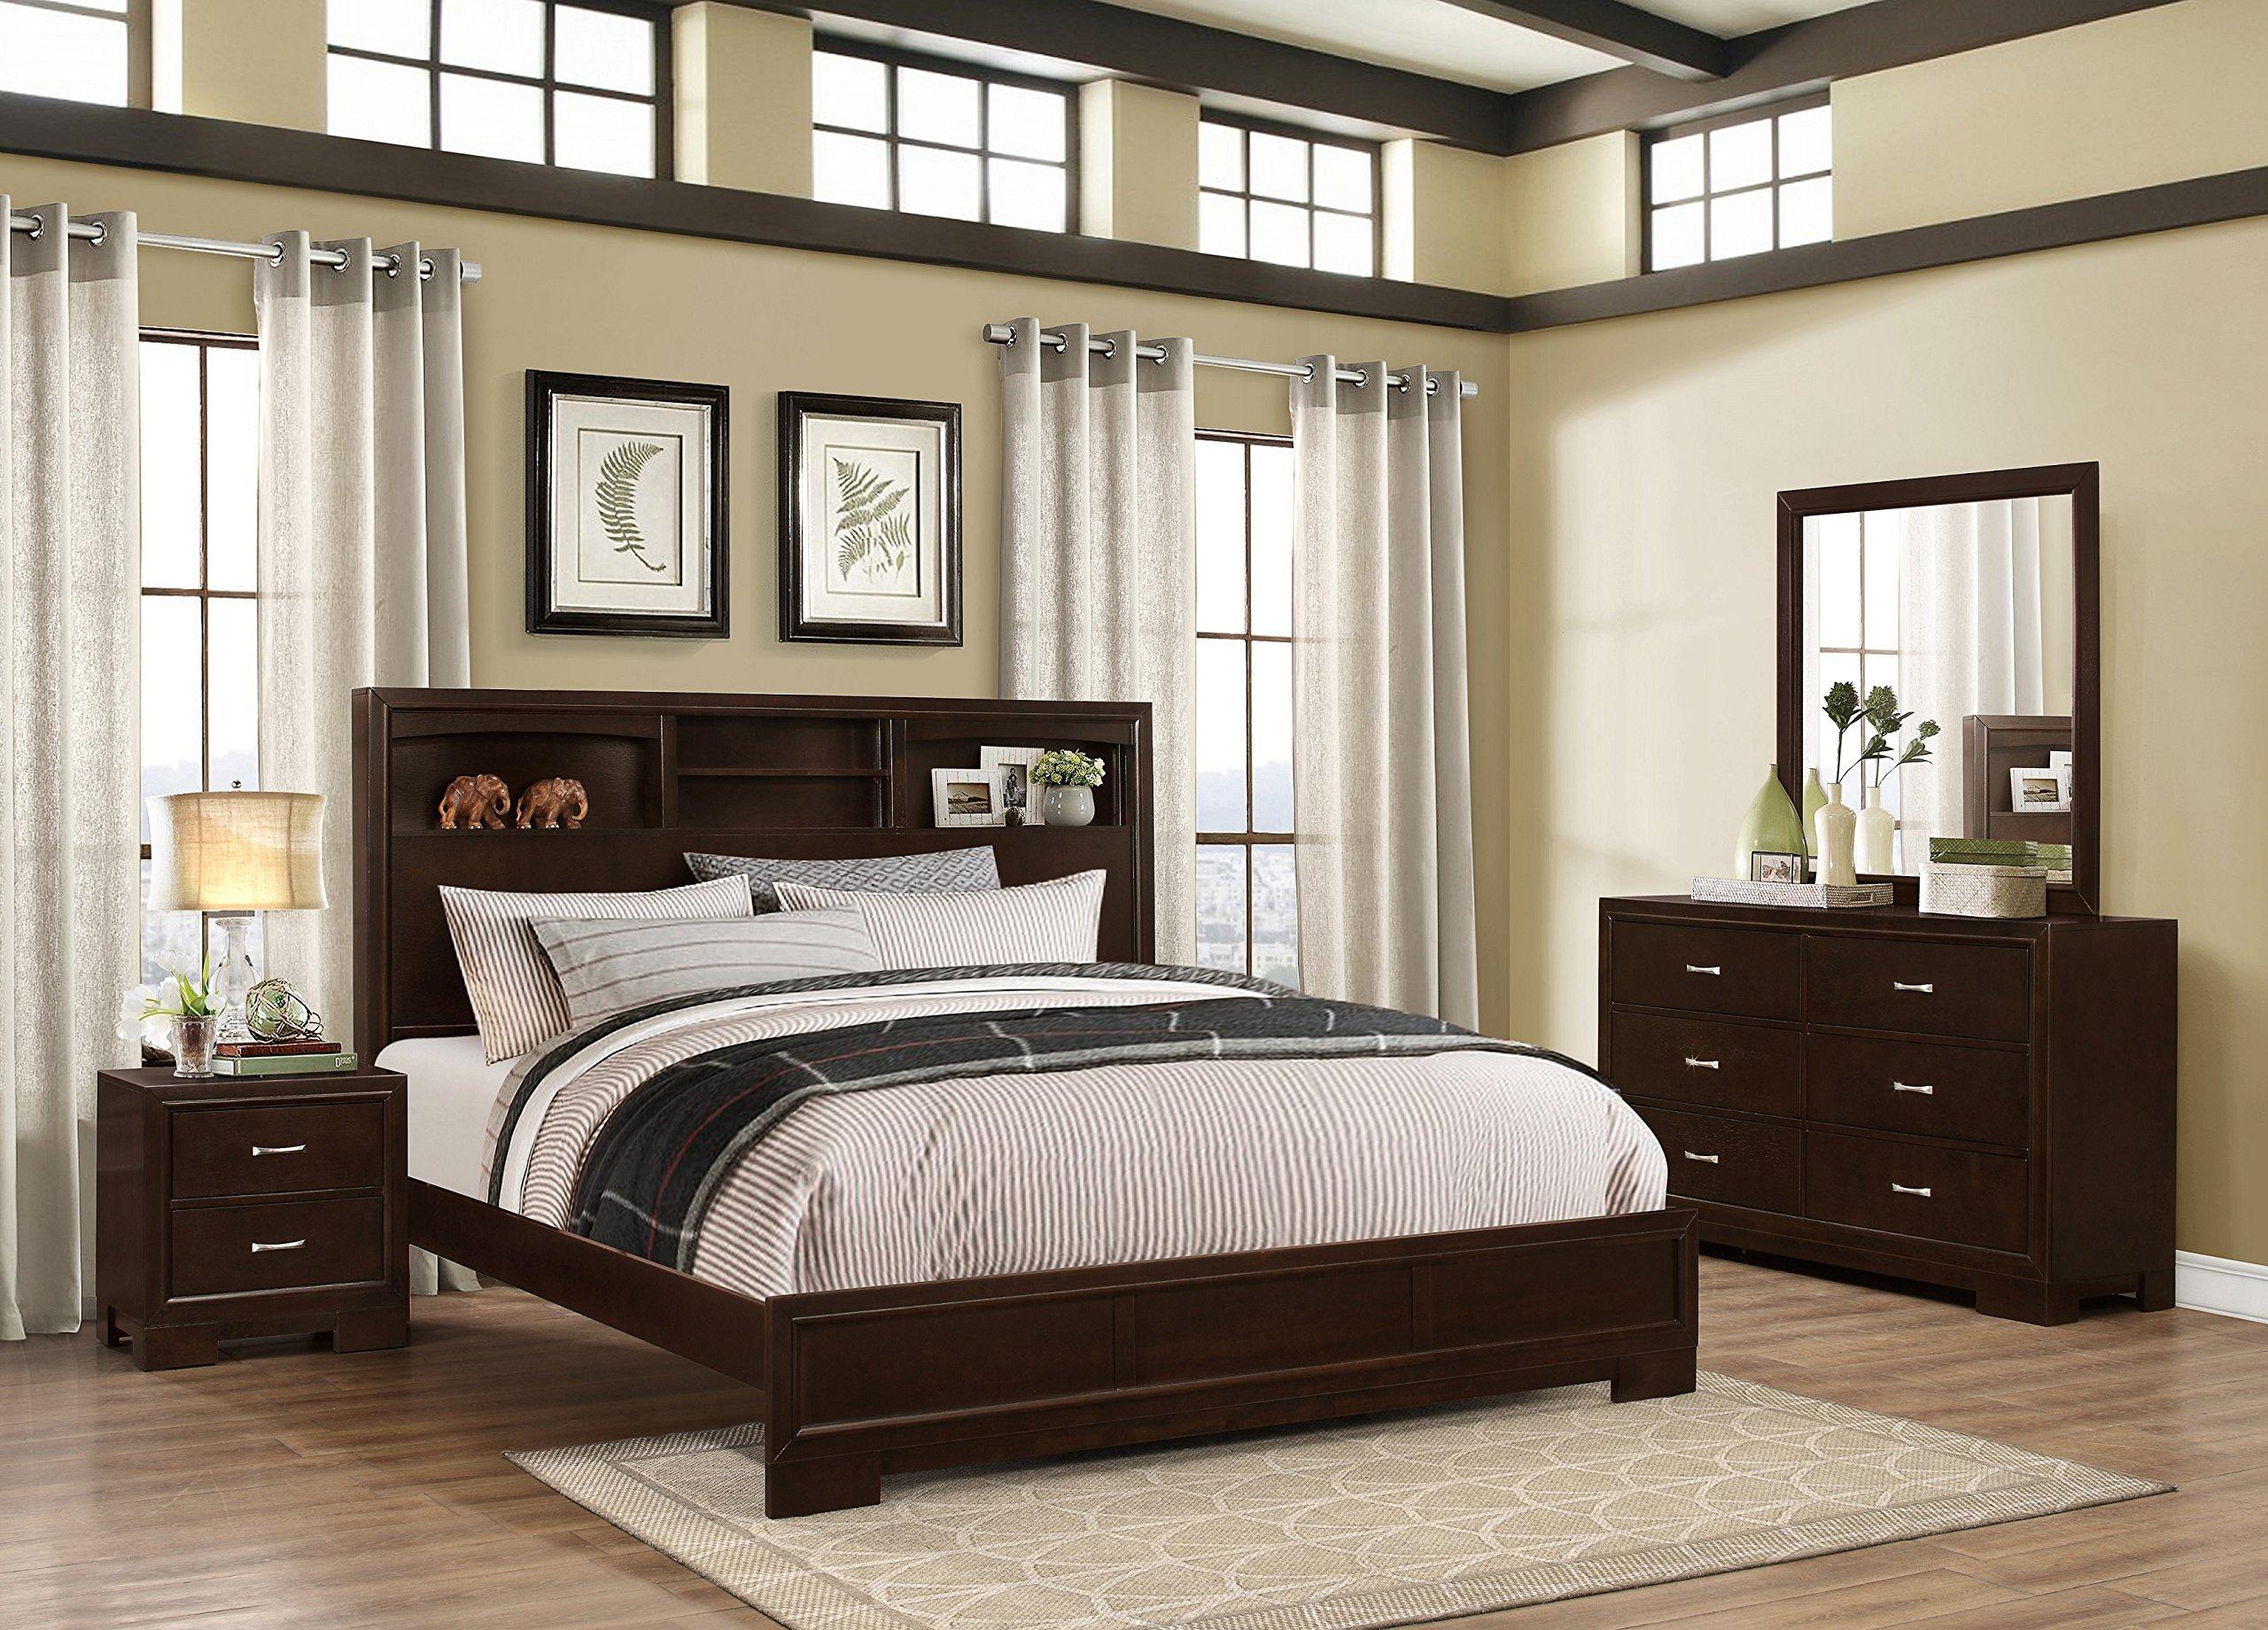 Roundhill Furniture Montana Modern 4-Piece Wood Bedroom Set with Bed, Dresser, Mirror, Nightstand, King, Walnut